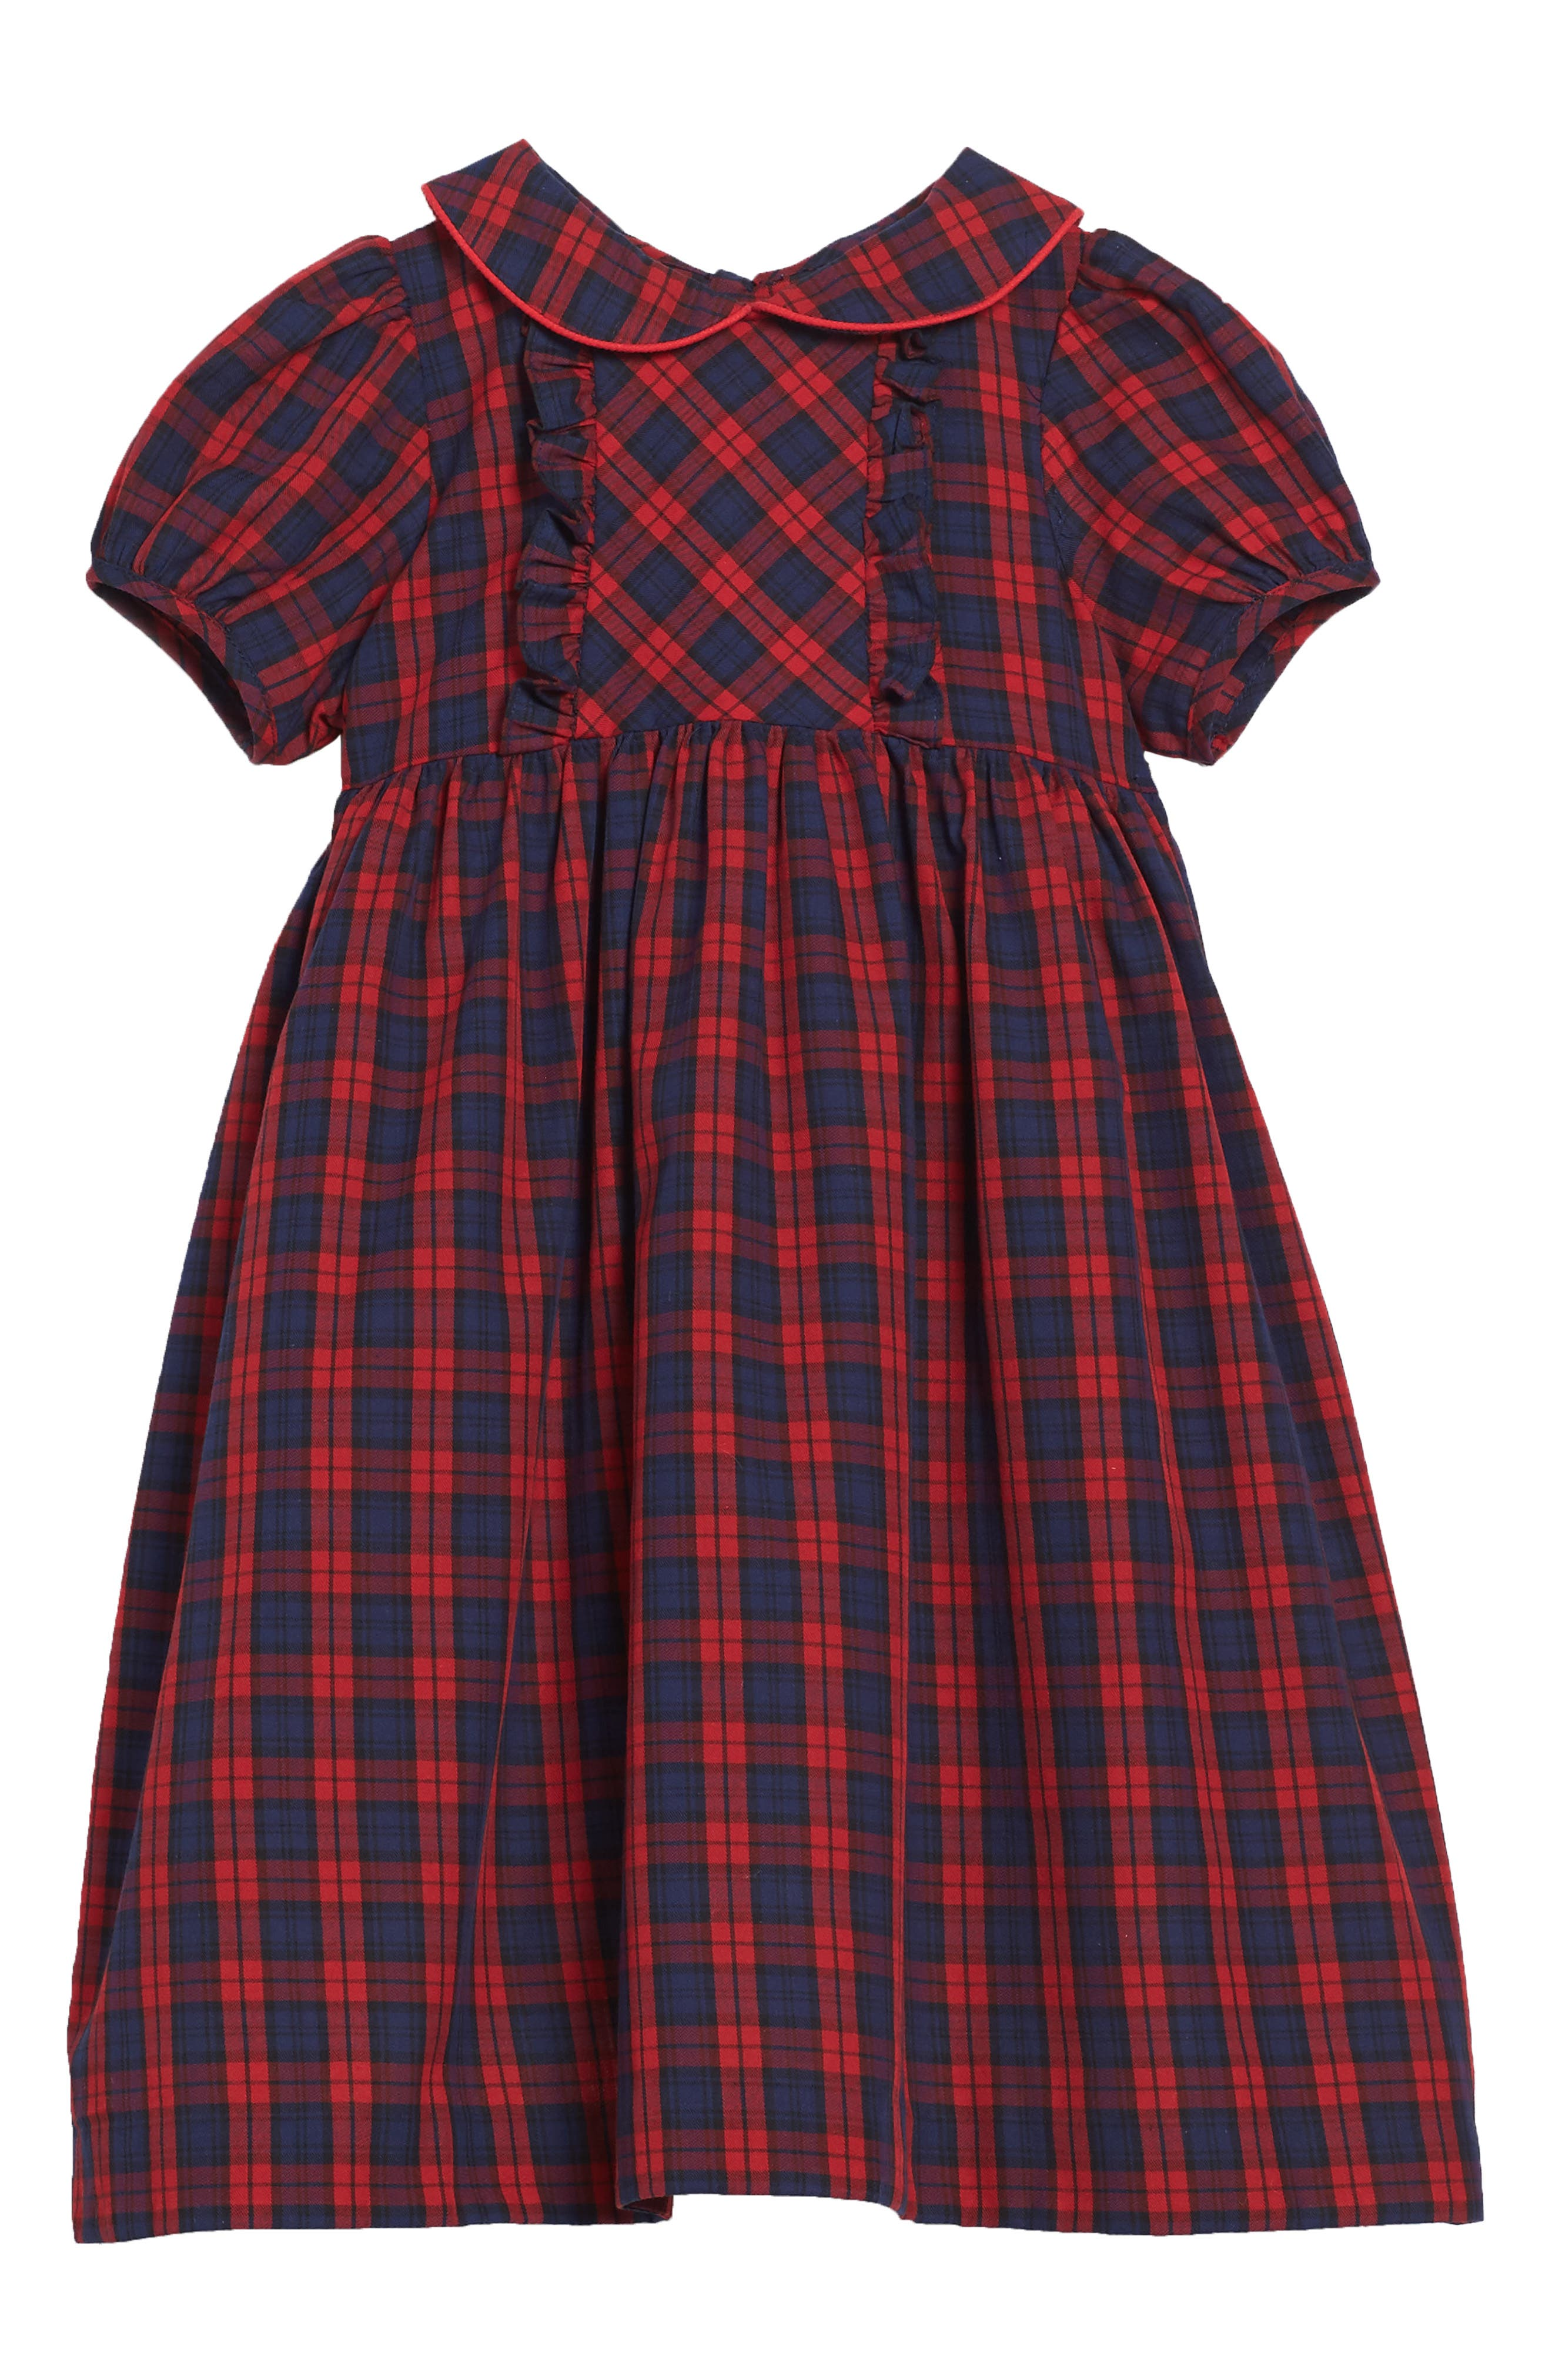 Alternate Image 1 Selected - Luli & Me Plaid Dress (Toddler Girls)